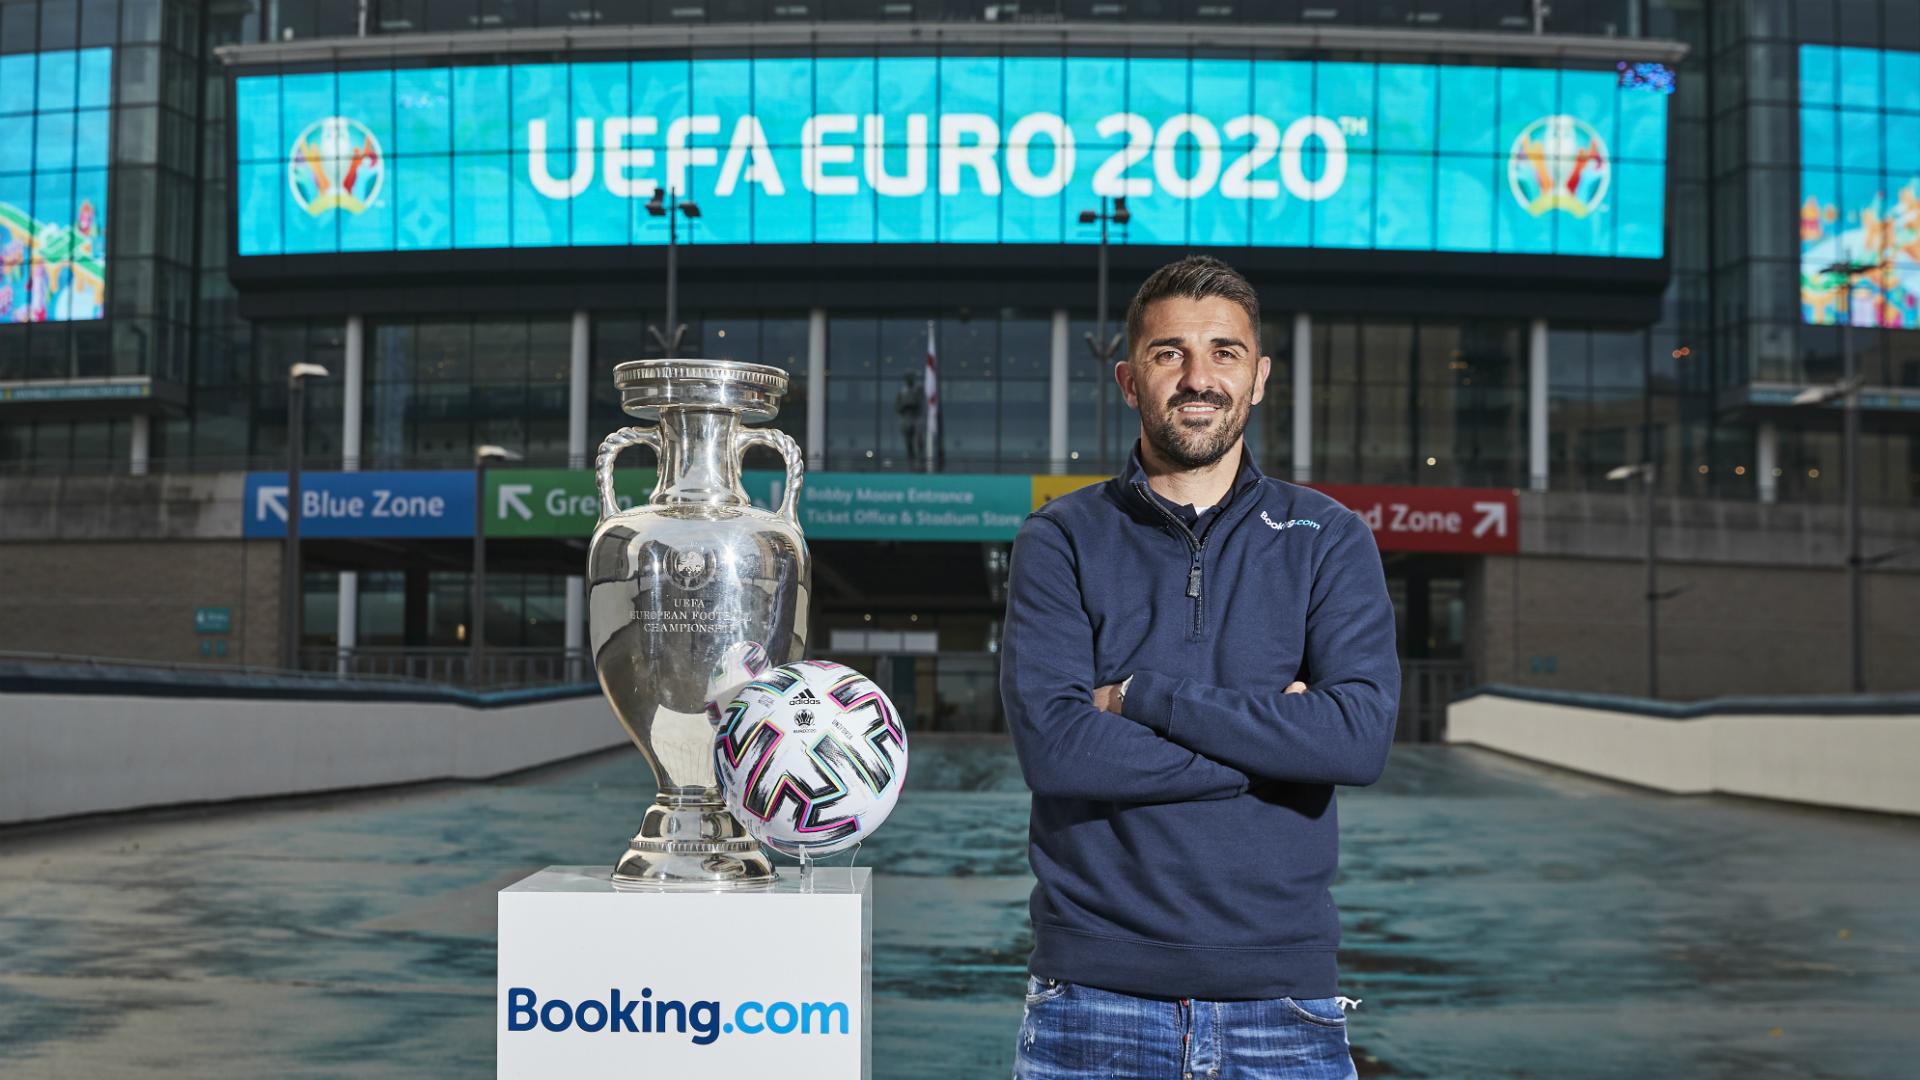 VIDEO : Avant l'UEFA EURO 2020